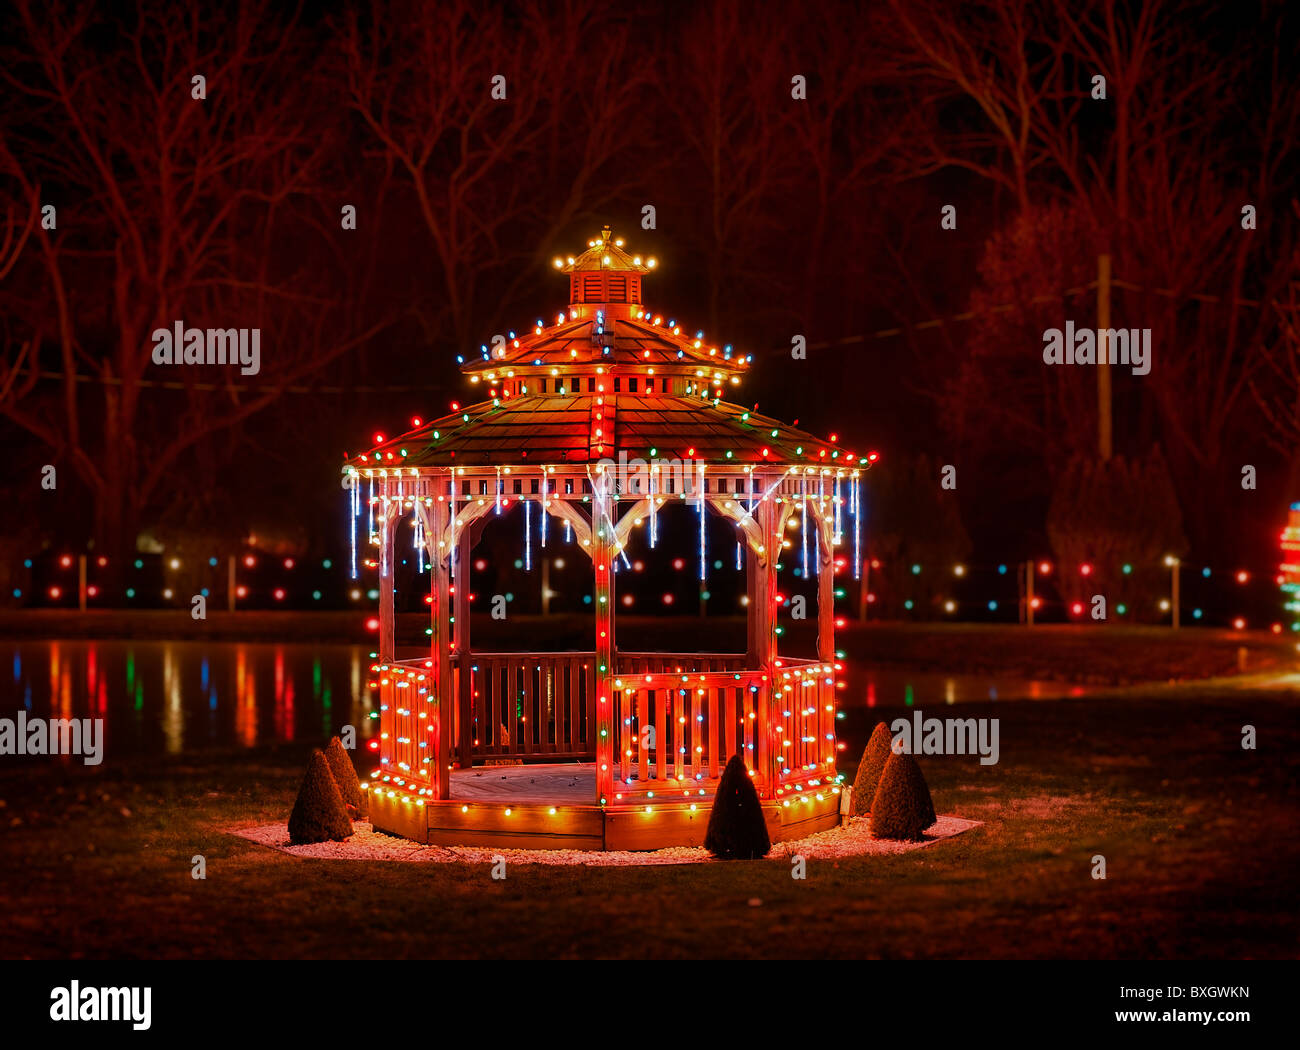 Gazebo decorated with Christmas lights, Koziar's Christmas Village ...